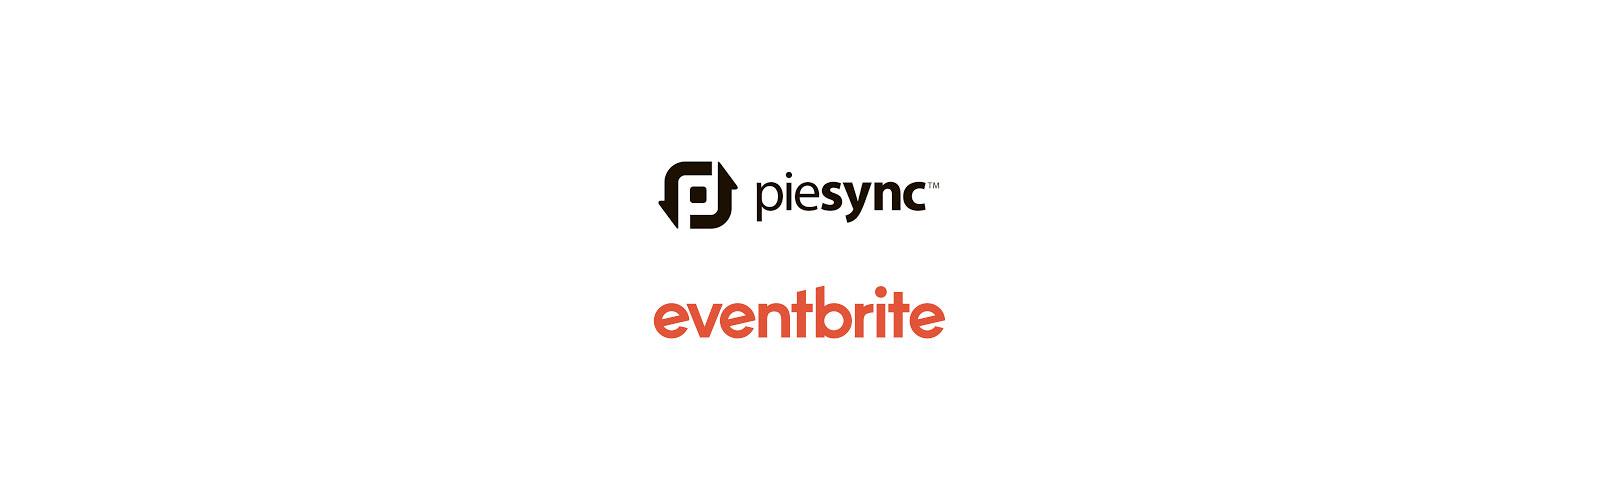 piesync-eventbrite